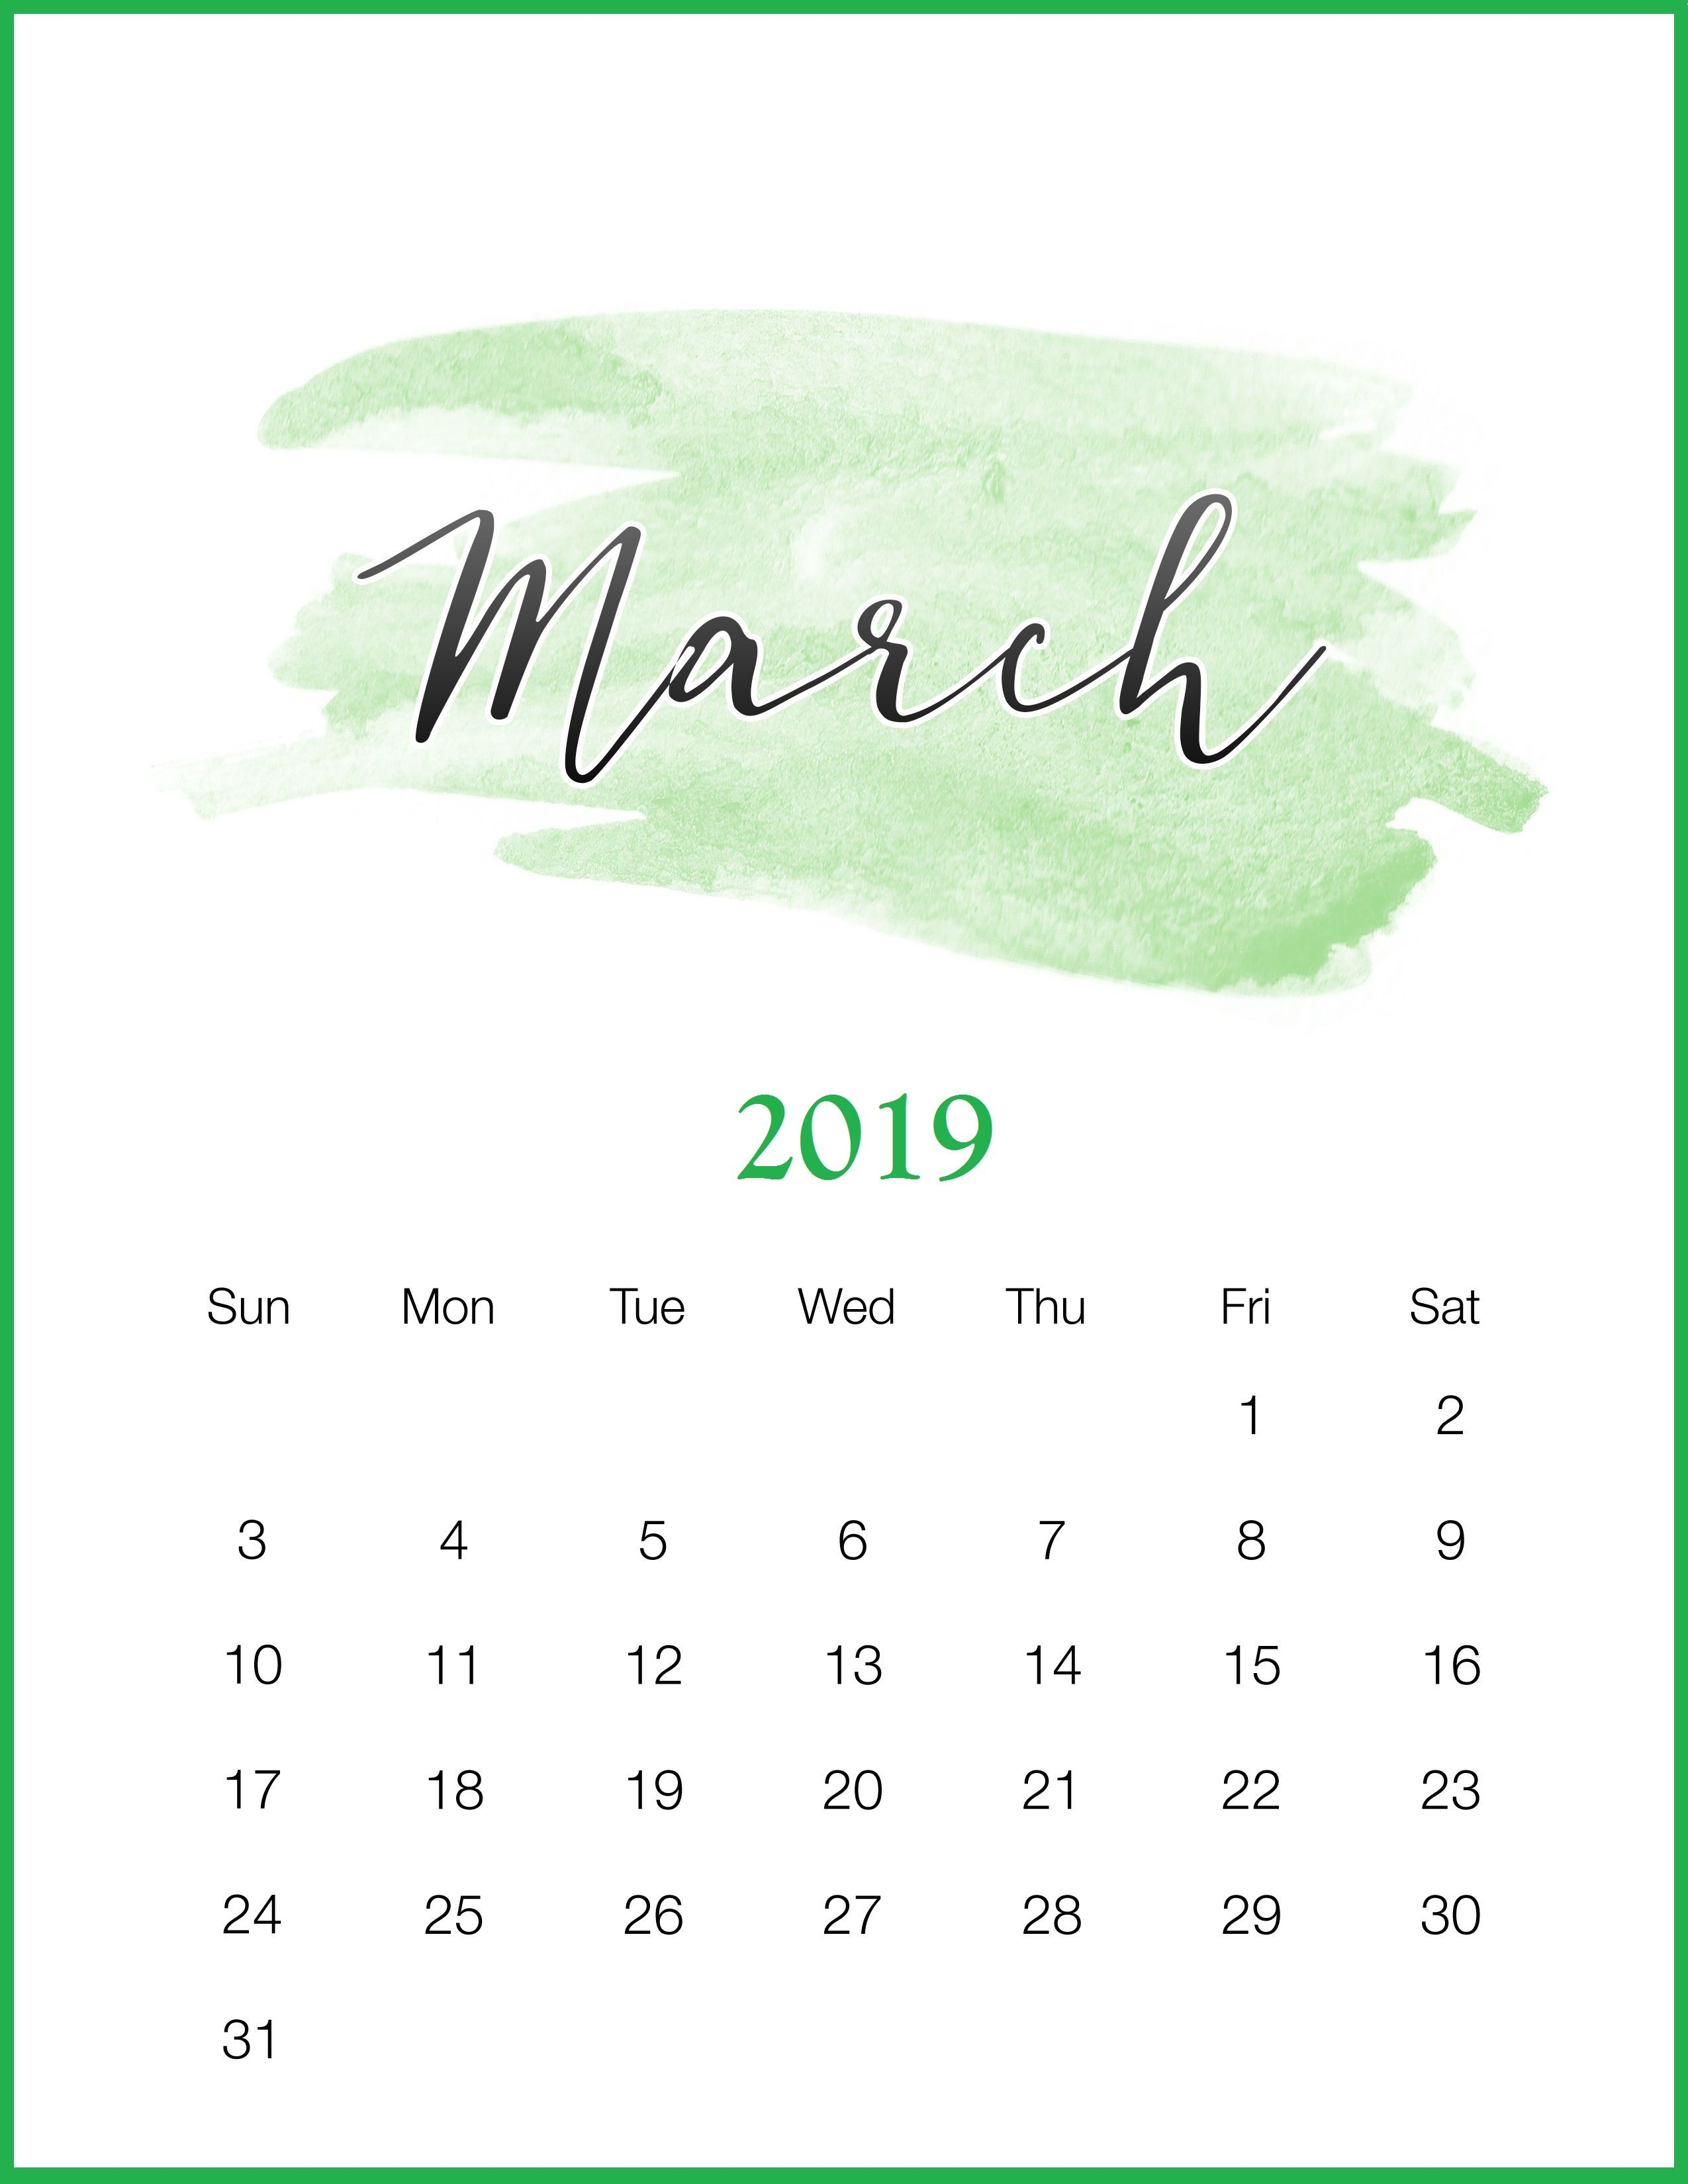 March Calendar Print Out Recientes Pin Od Justyna Na Hobby organization Of March Calendar Print Out Recientes Monthly Calendar 2015 Template Printable 2016 Calendar Templates